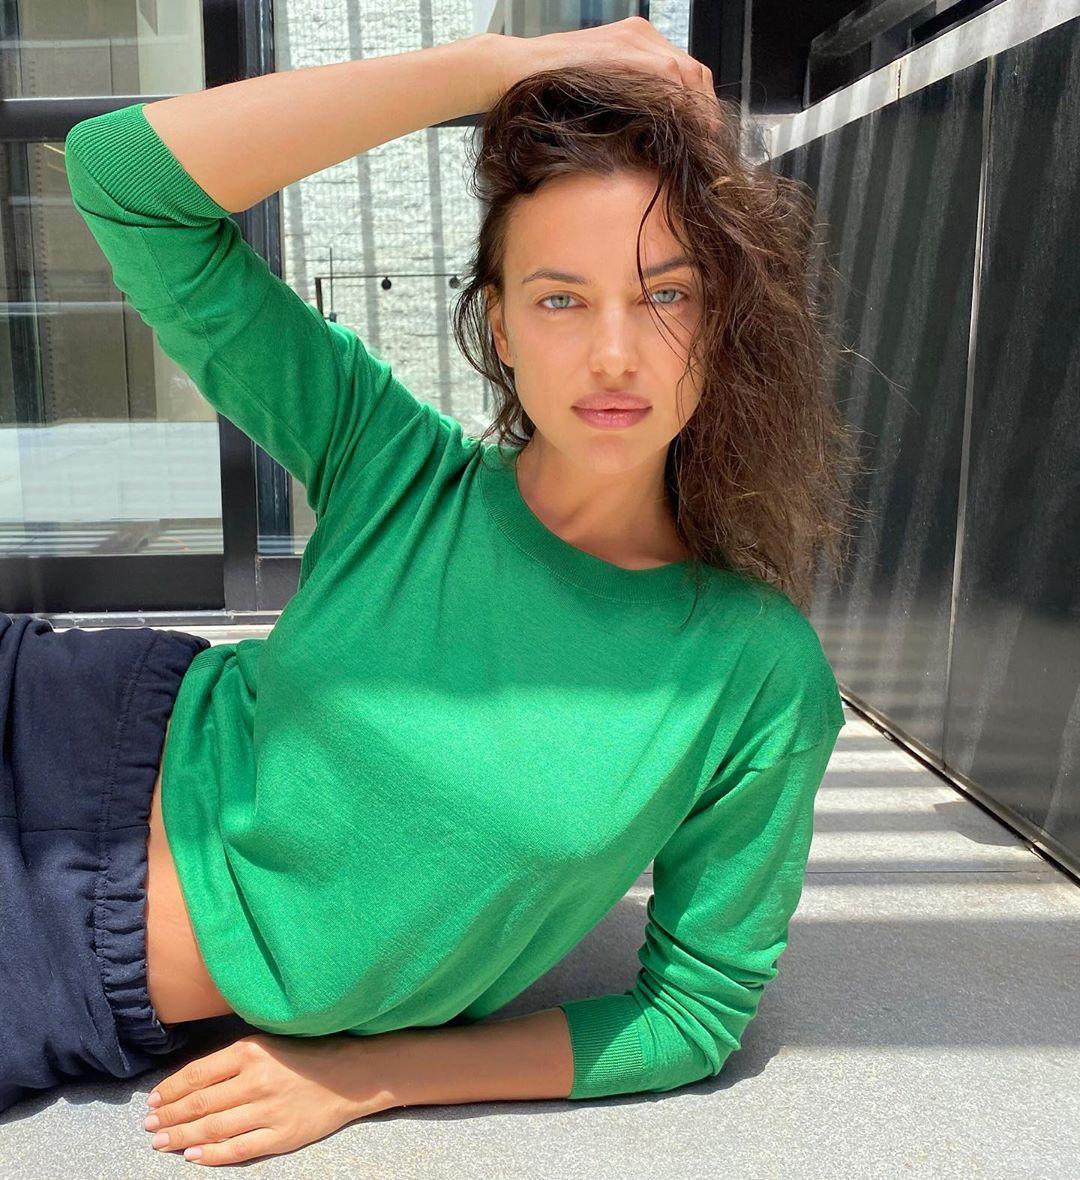 Irina-Shayk-Wallpapers-Insta-Fit-BIo-1